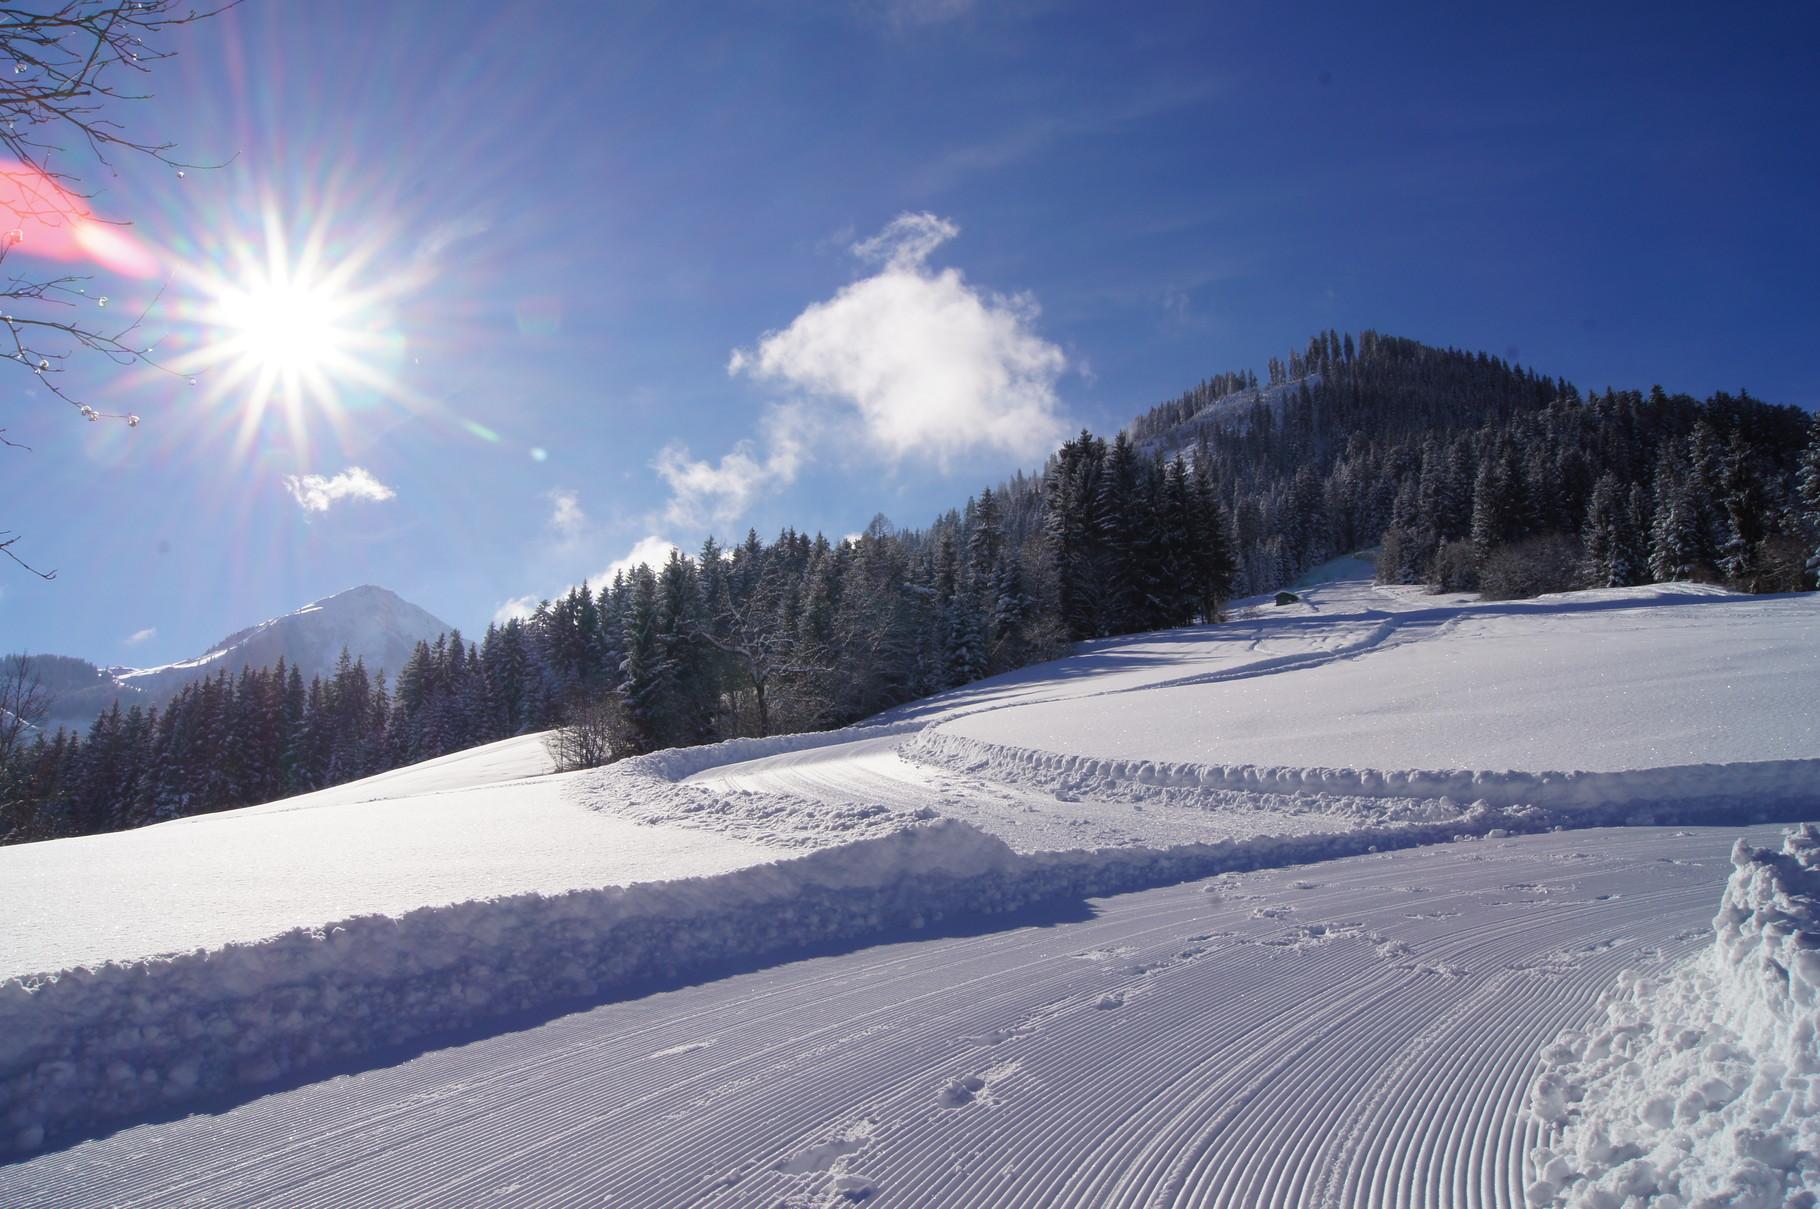 Ski run 16a